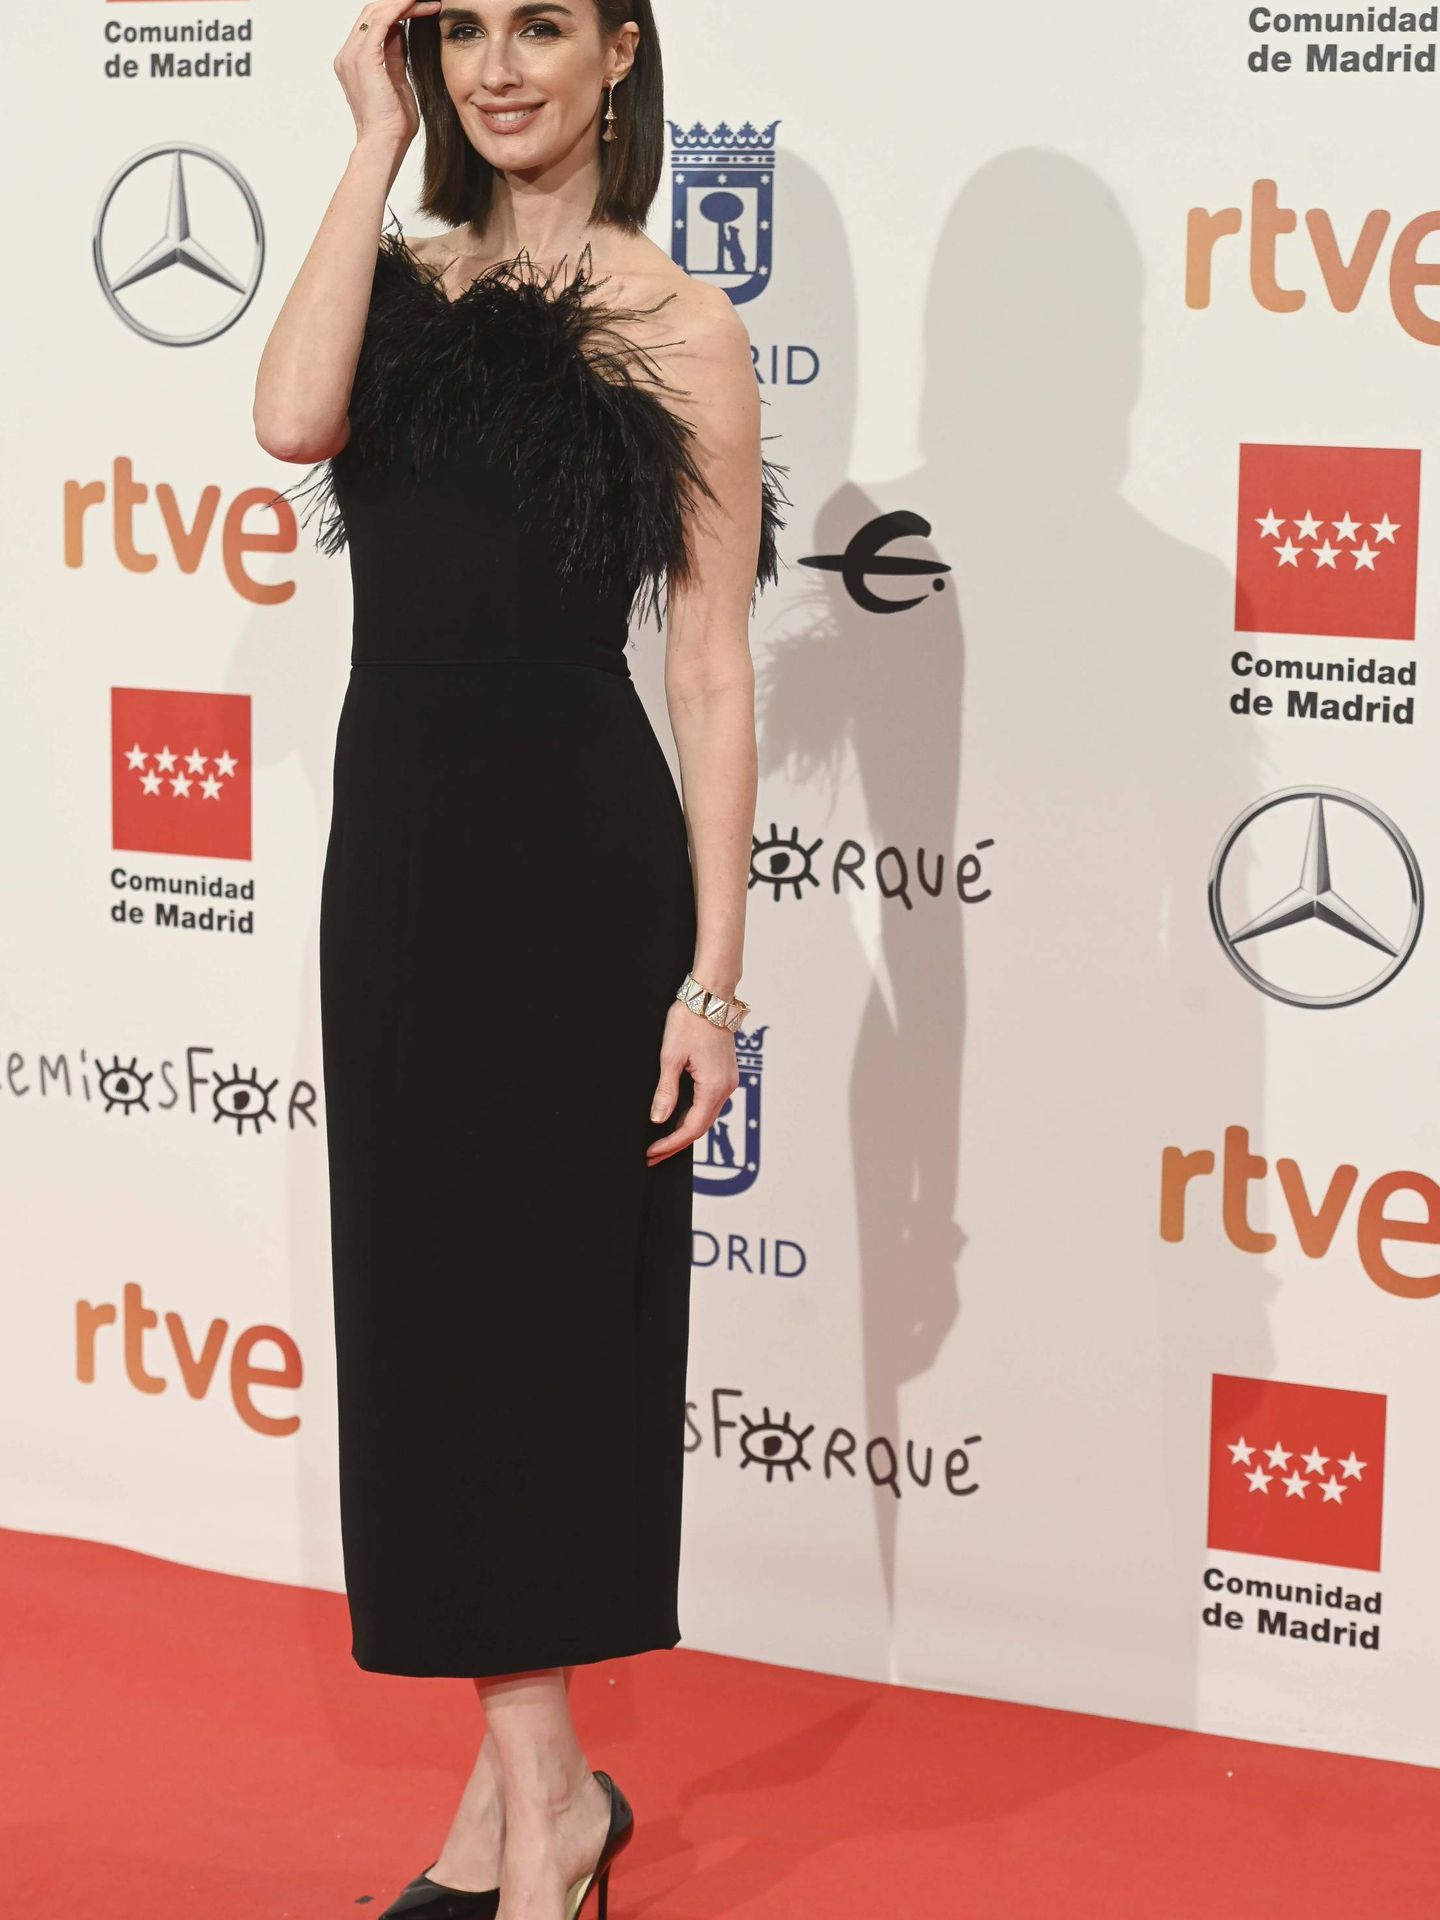 Paz Vega en los Premios Forqué 2020 (Cordon Press)